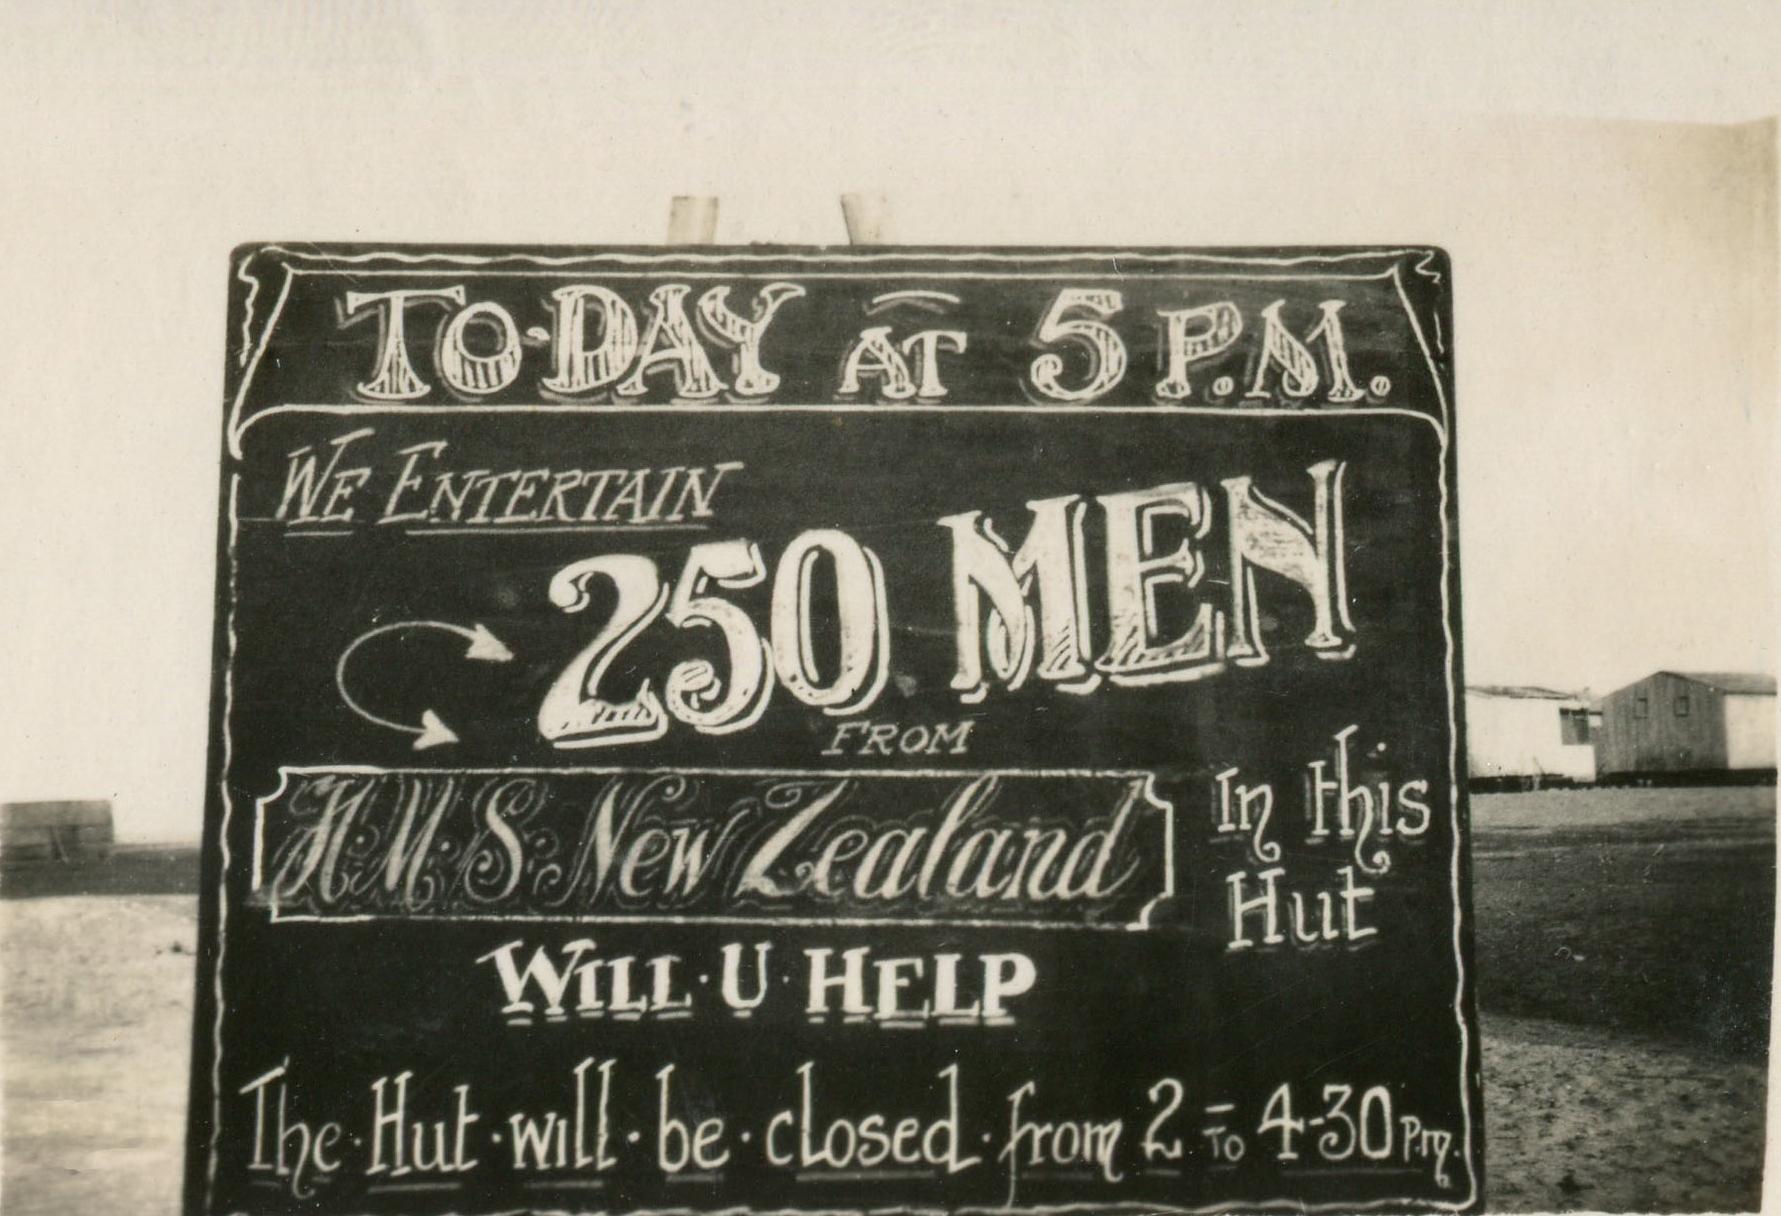 reg walters086 Entertaining 250 men from HMS New Zealand.jpg